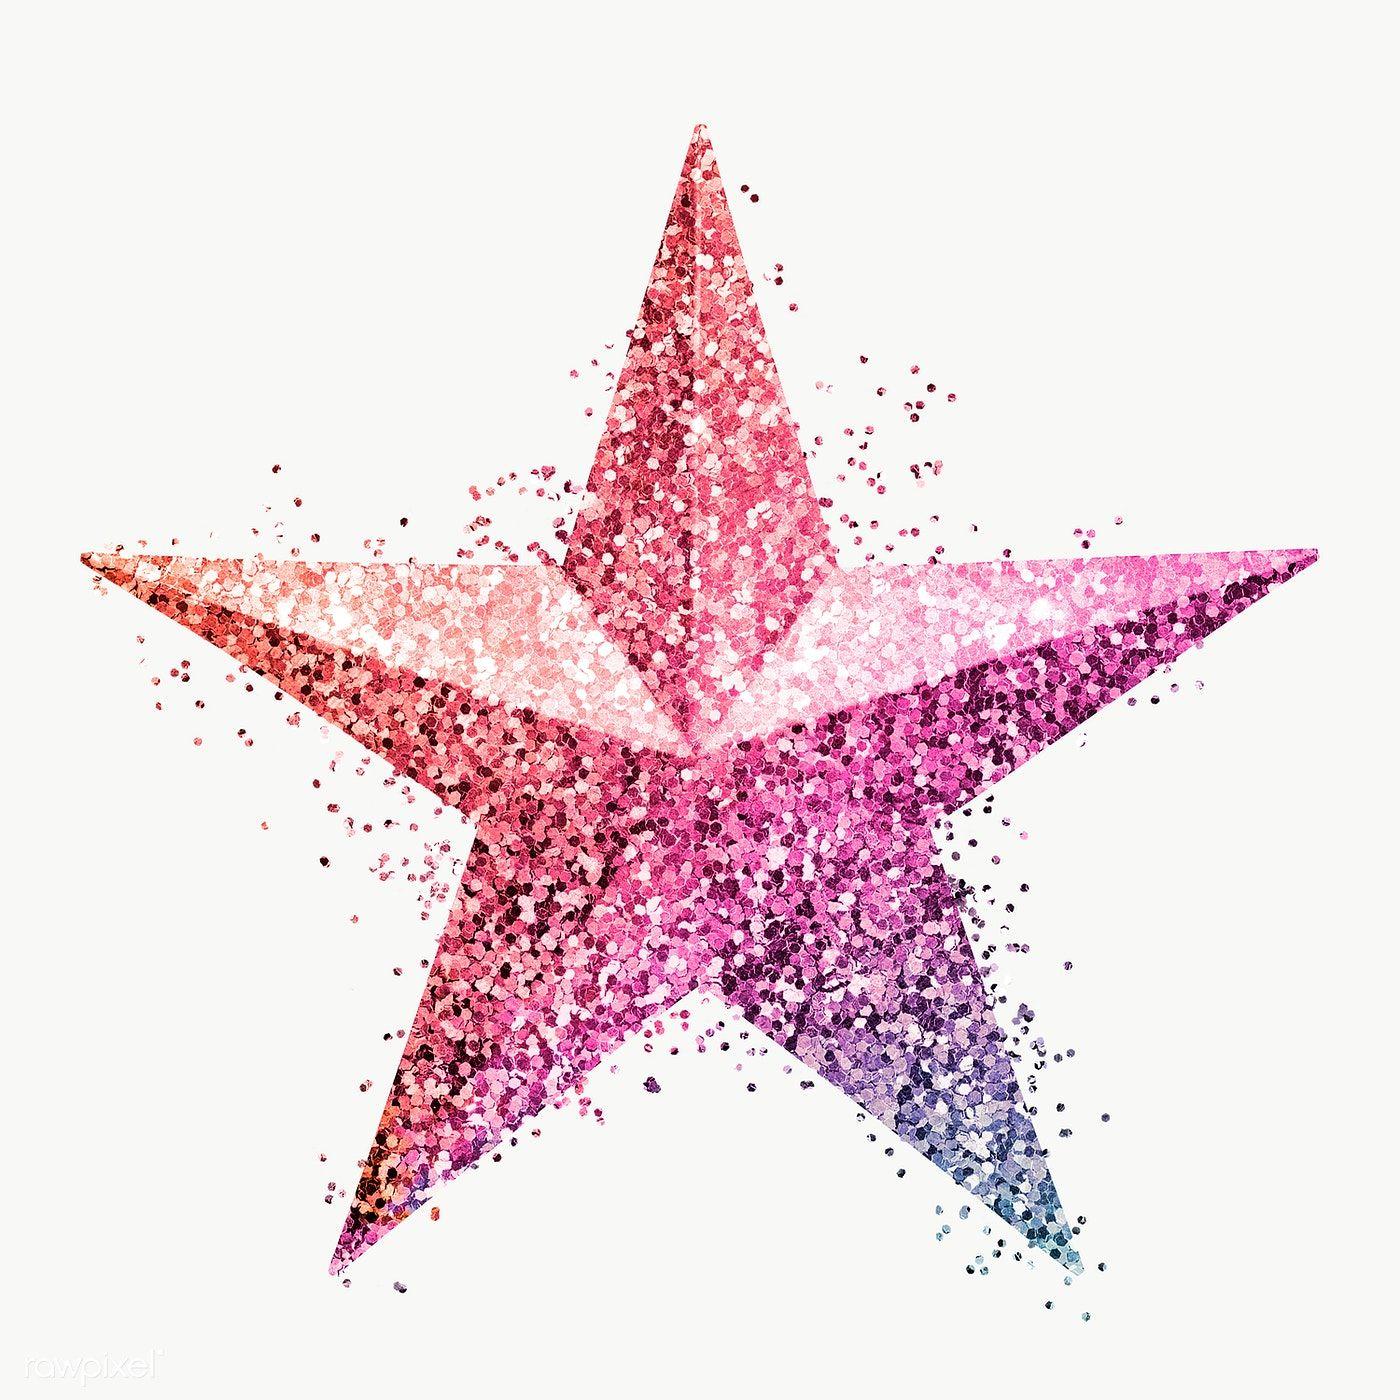 Glitter Magenta Star Design Element Free Image By Rawpixel Com Ployploy In 2020 Star Designs Star Stickers Design Element